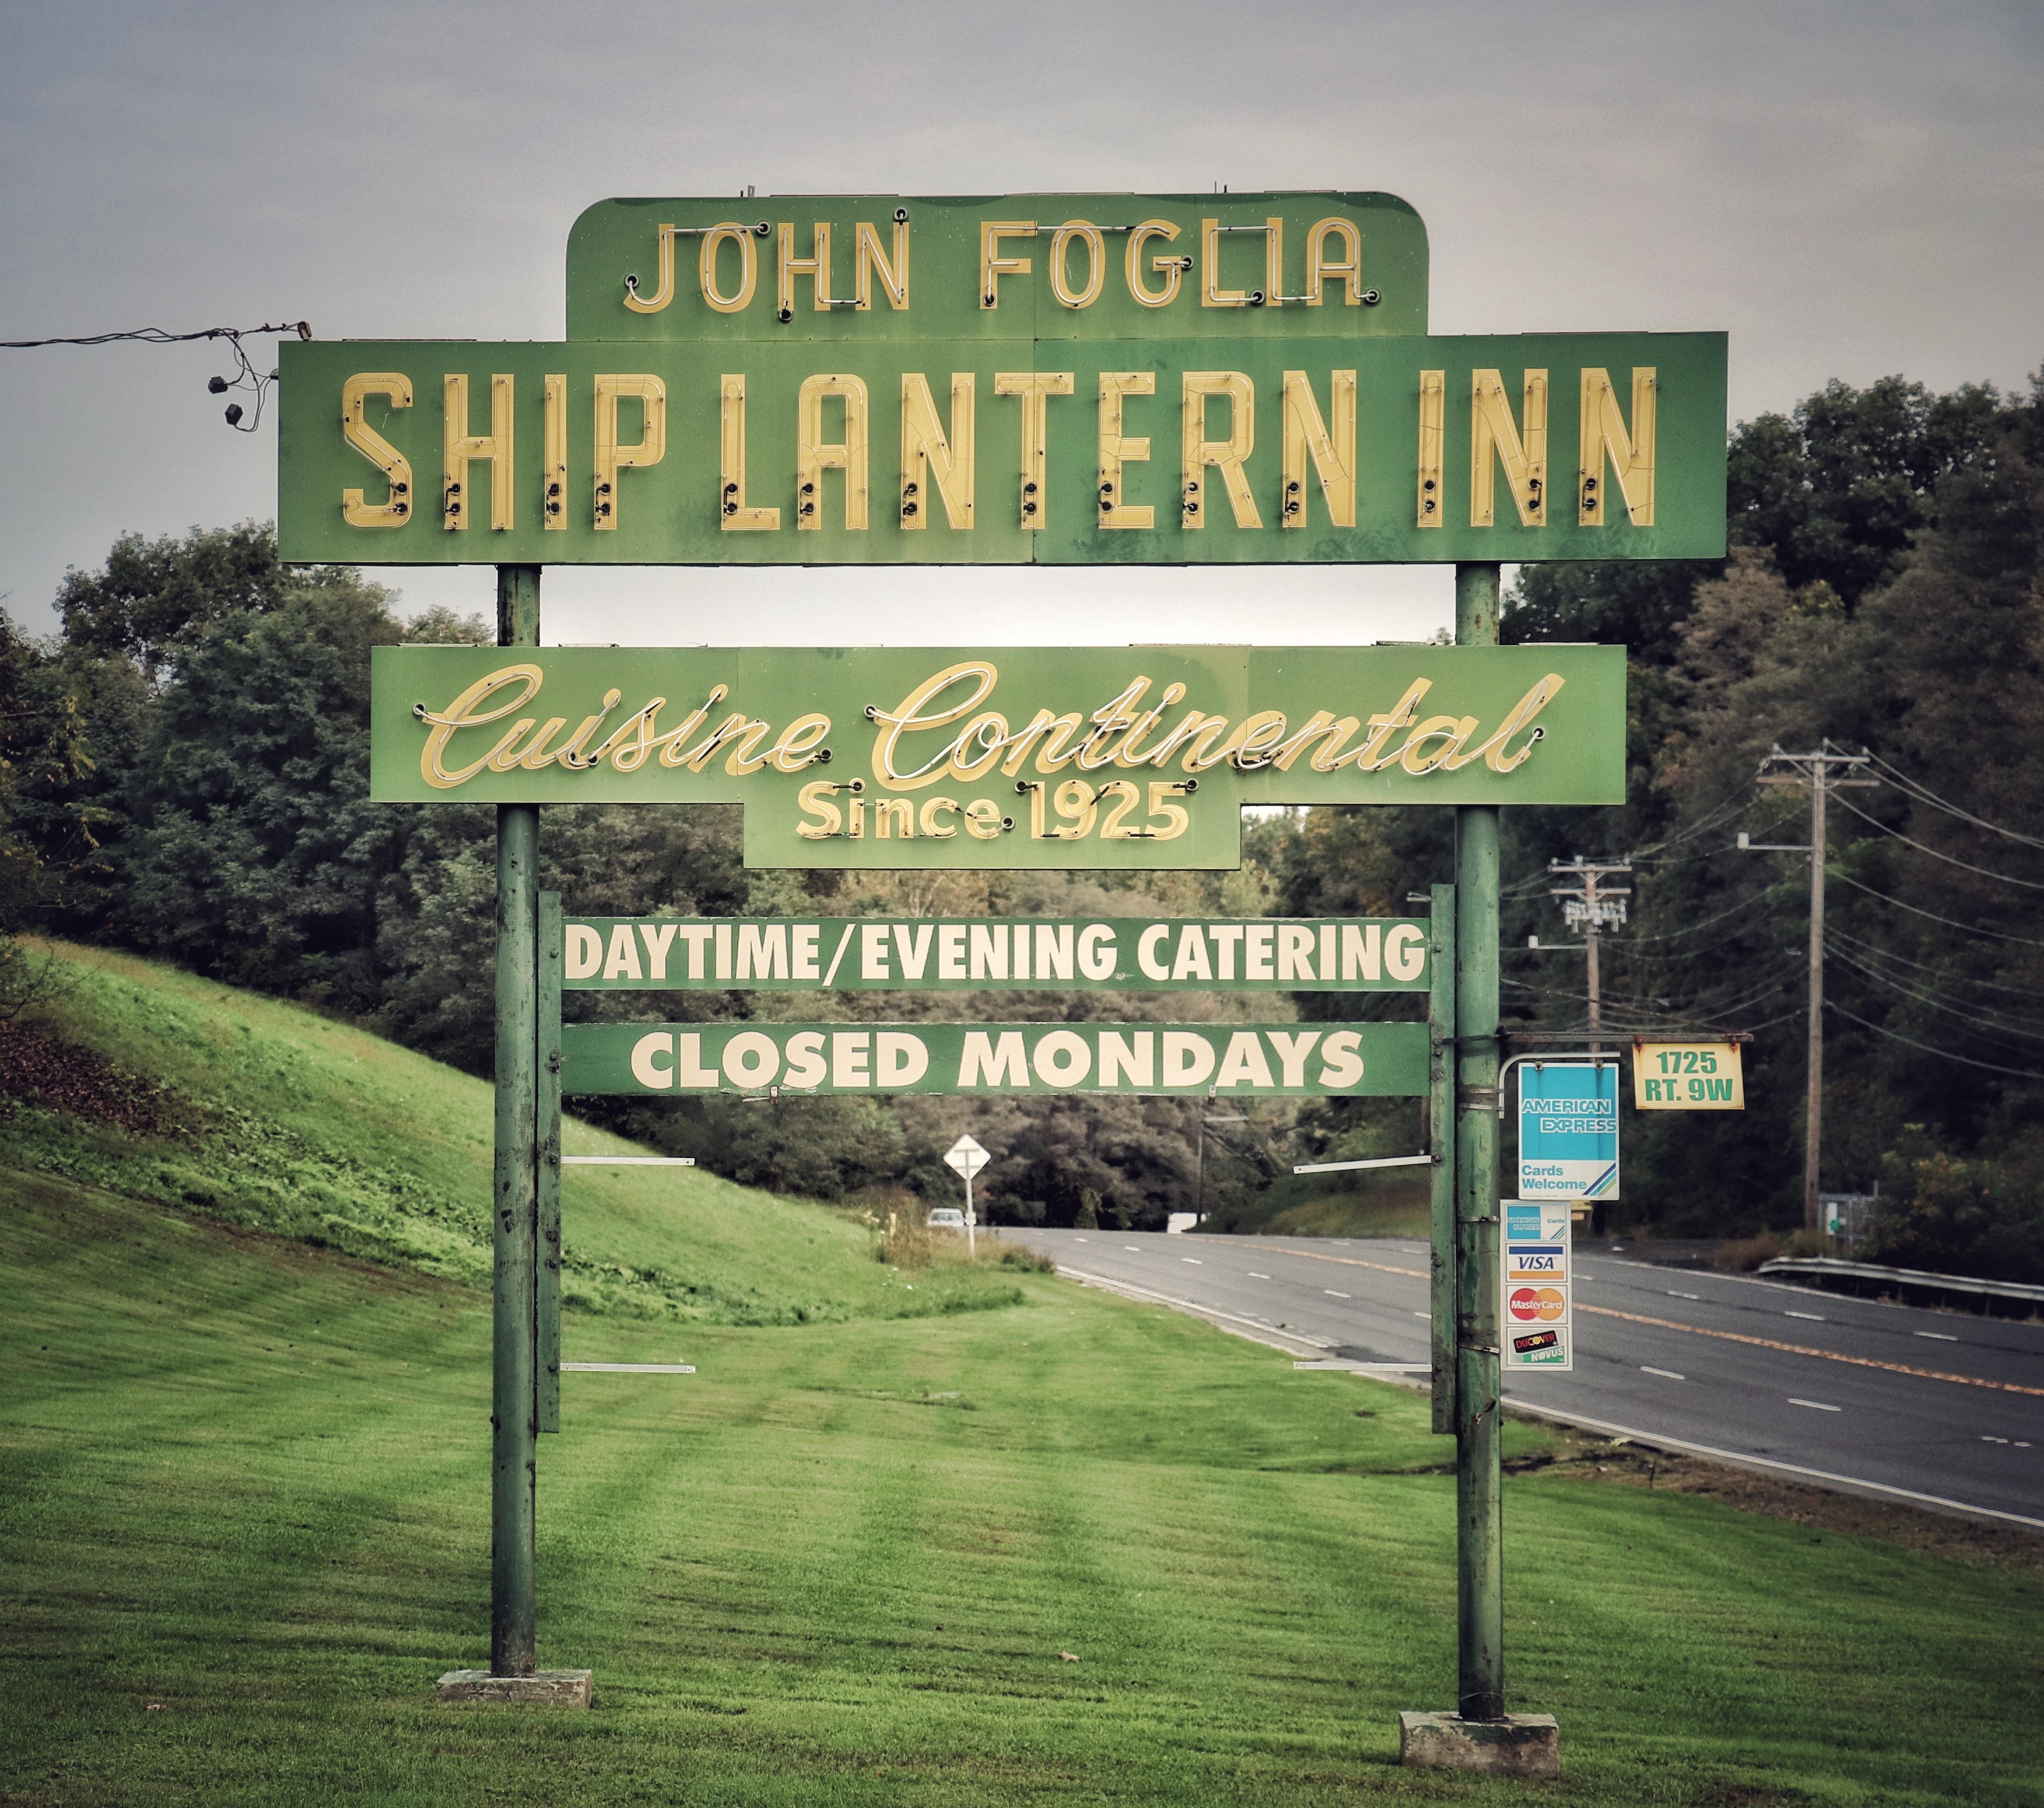 Ship Lantern Inn - 1725 Route 9W, Milton, New York U.S.A. - October 13, 2018